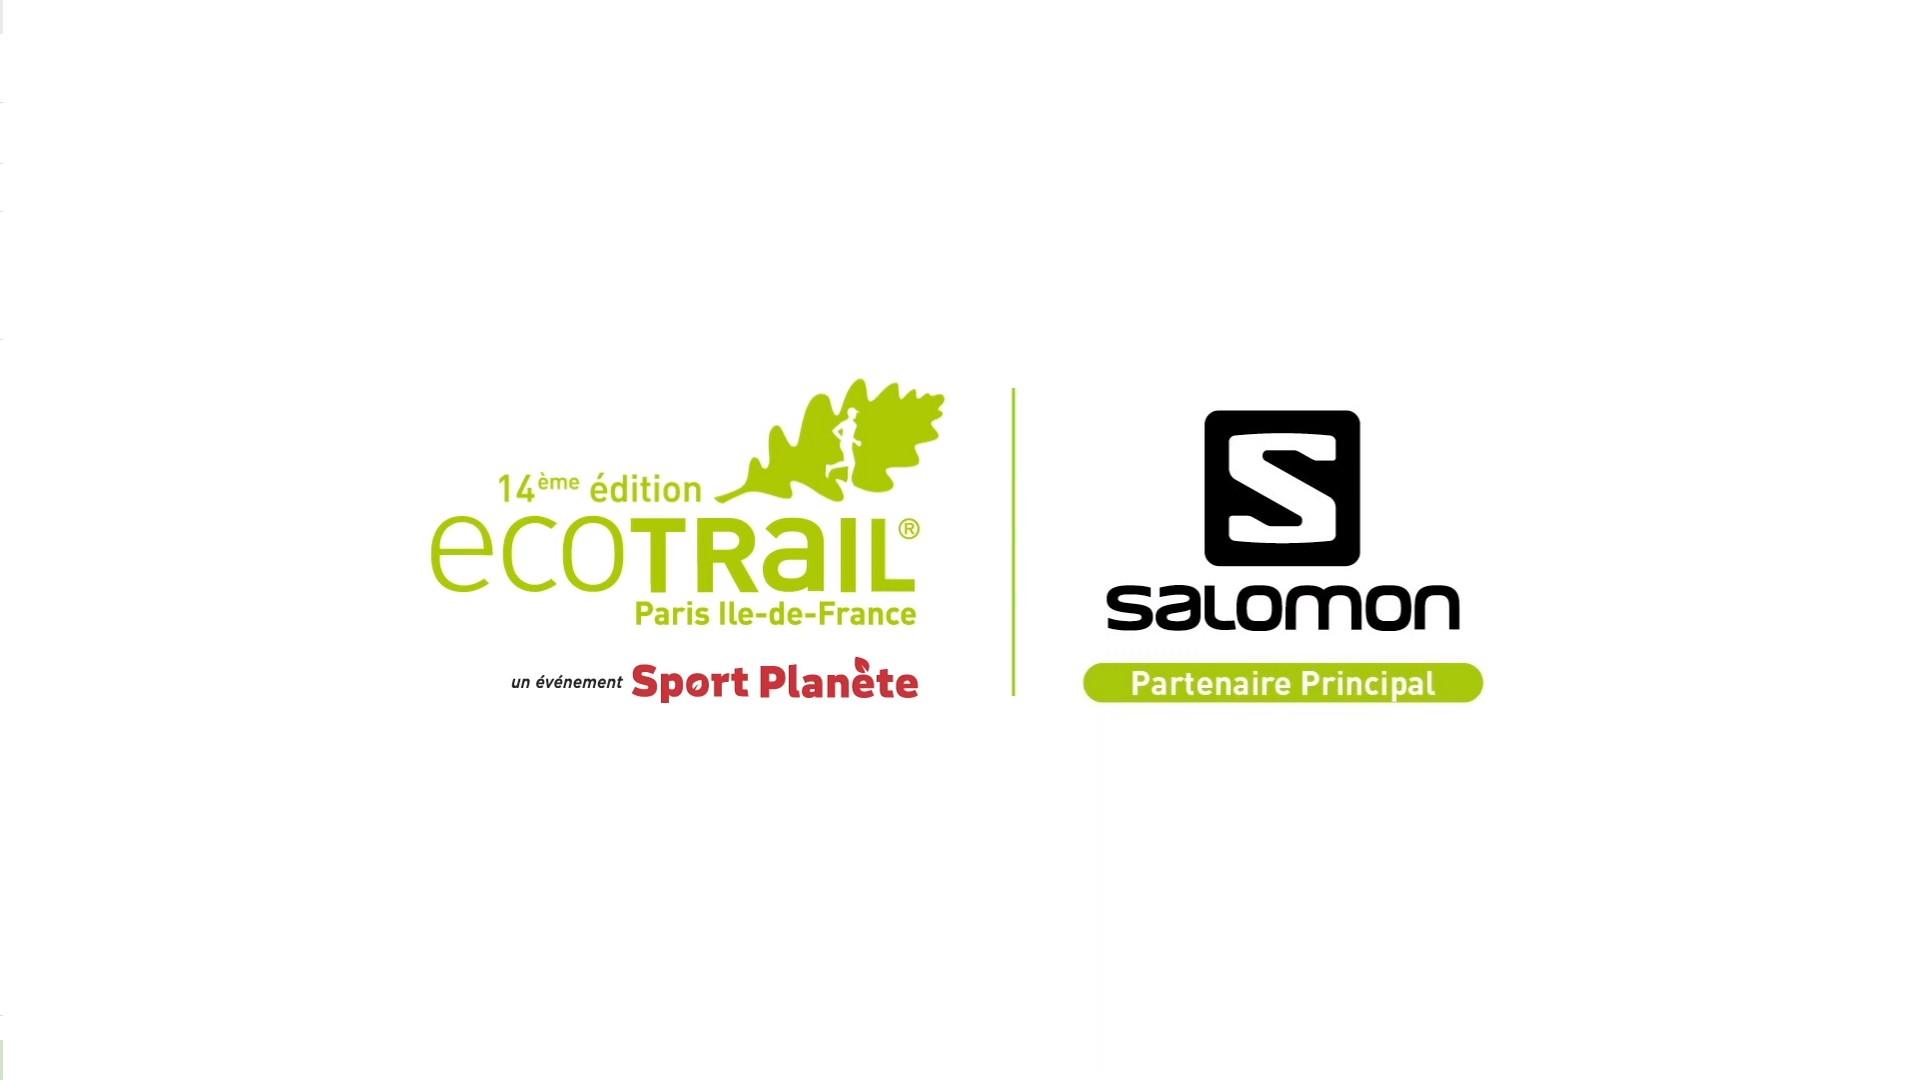 Salomon x Ecotrail (athlétisme) 2021